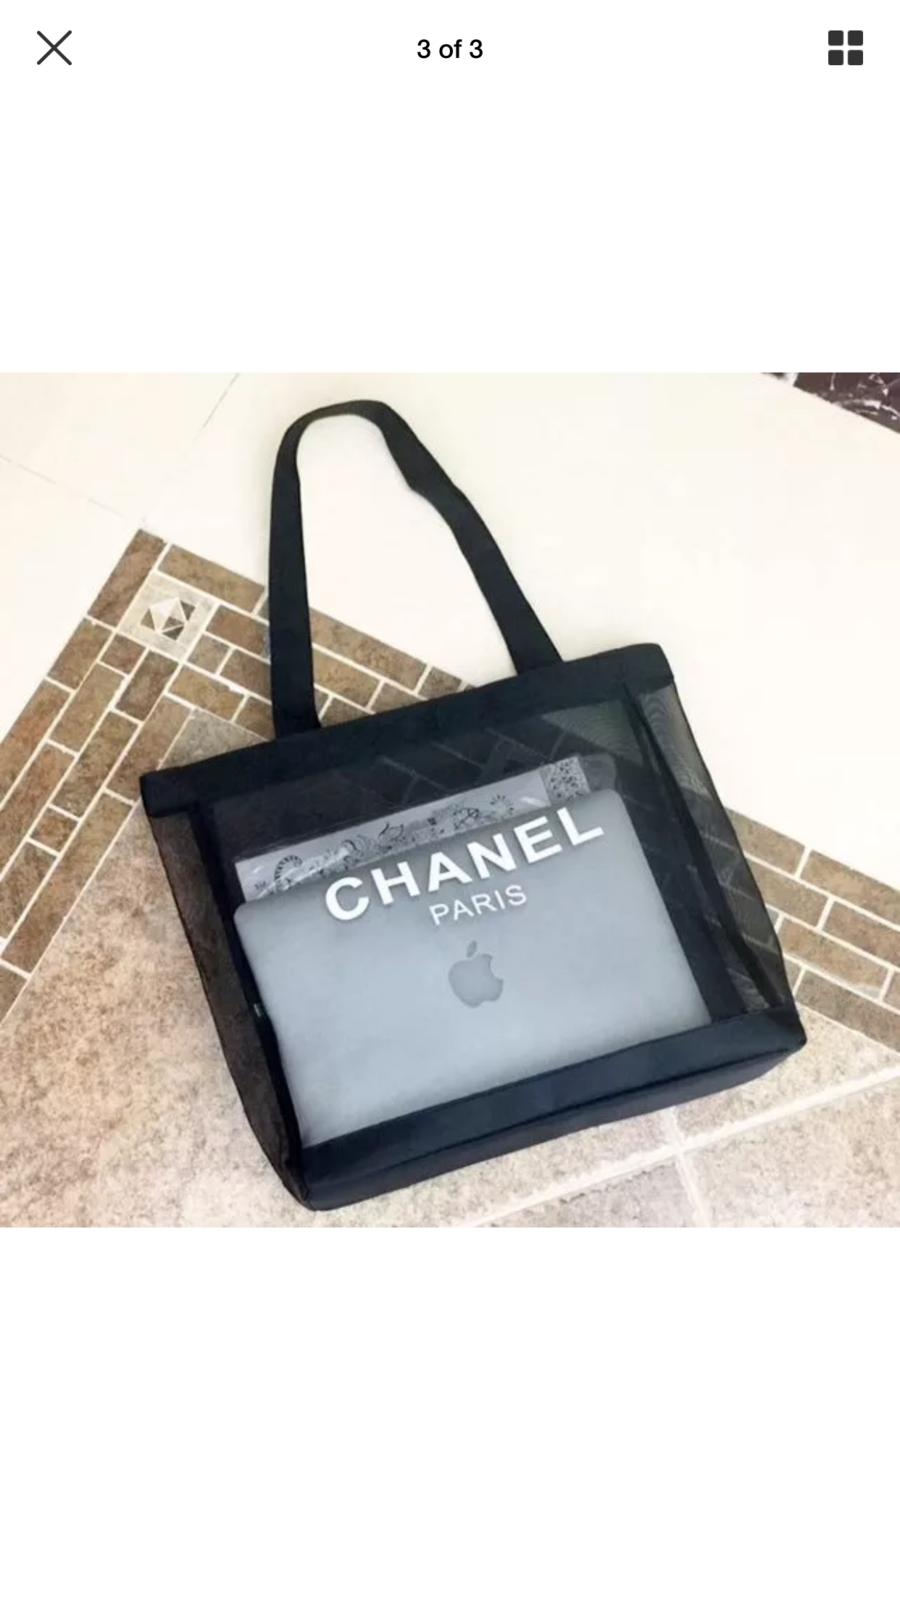 3af866941ebe3c Chanel VIP Gift Beach/Tote Bags and 50 similar items. Aebd4305 f06b 4577  950e cc58917b21f5